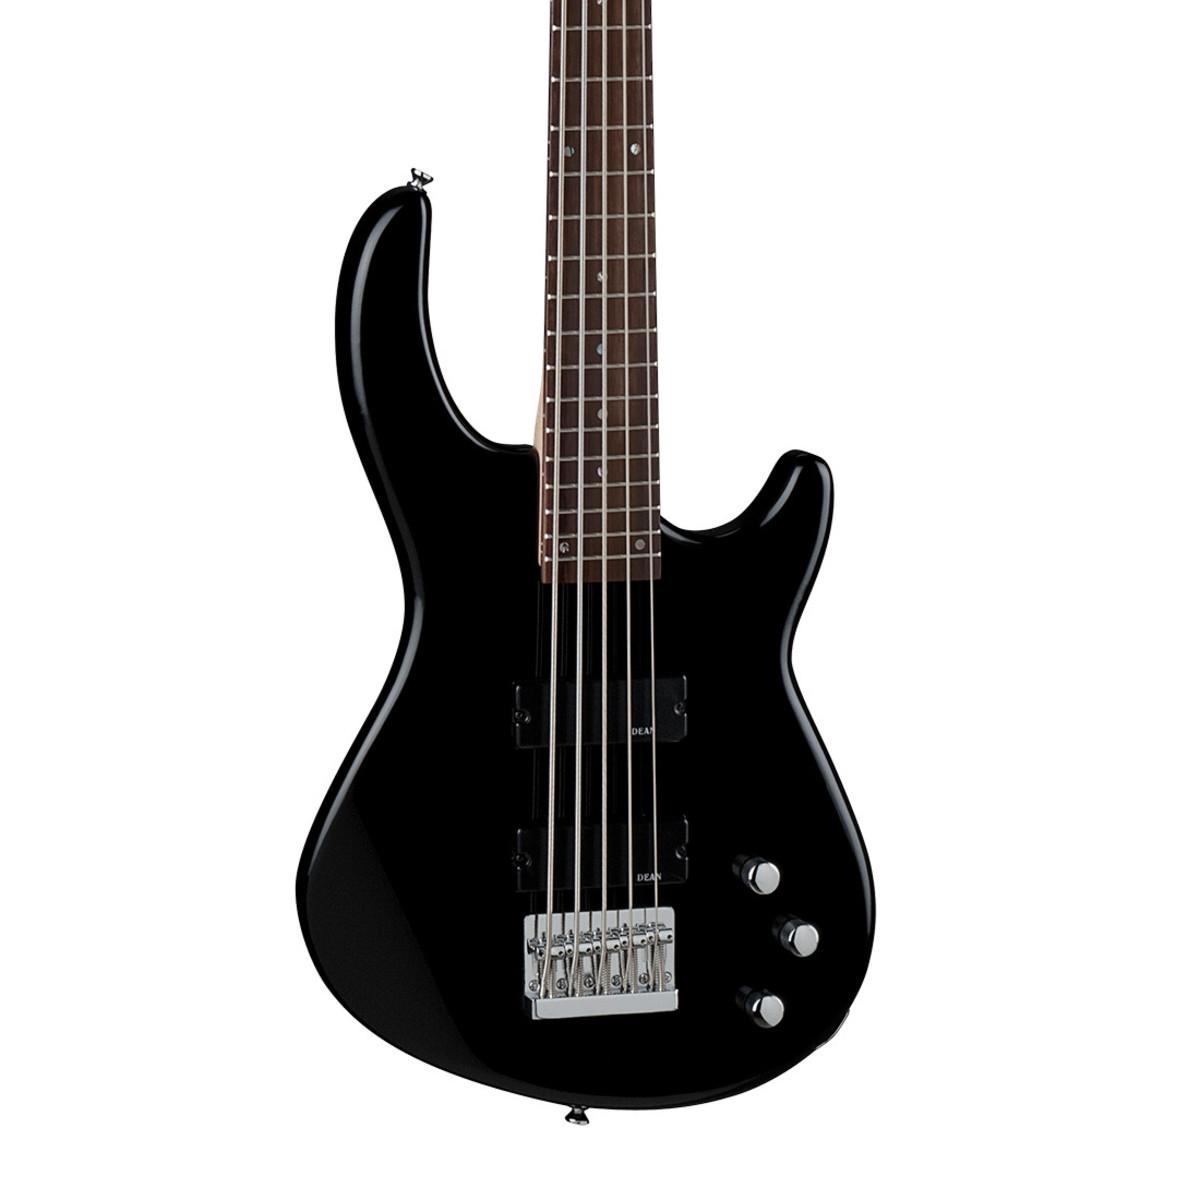 dean edge 1 5 string bass guitar classic black at. Black Bedroom Furniture Sets. Home Design Ideas